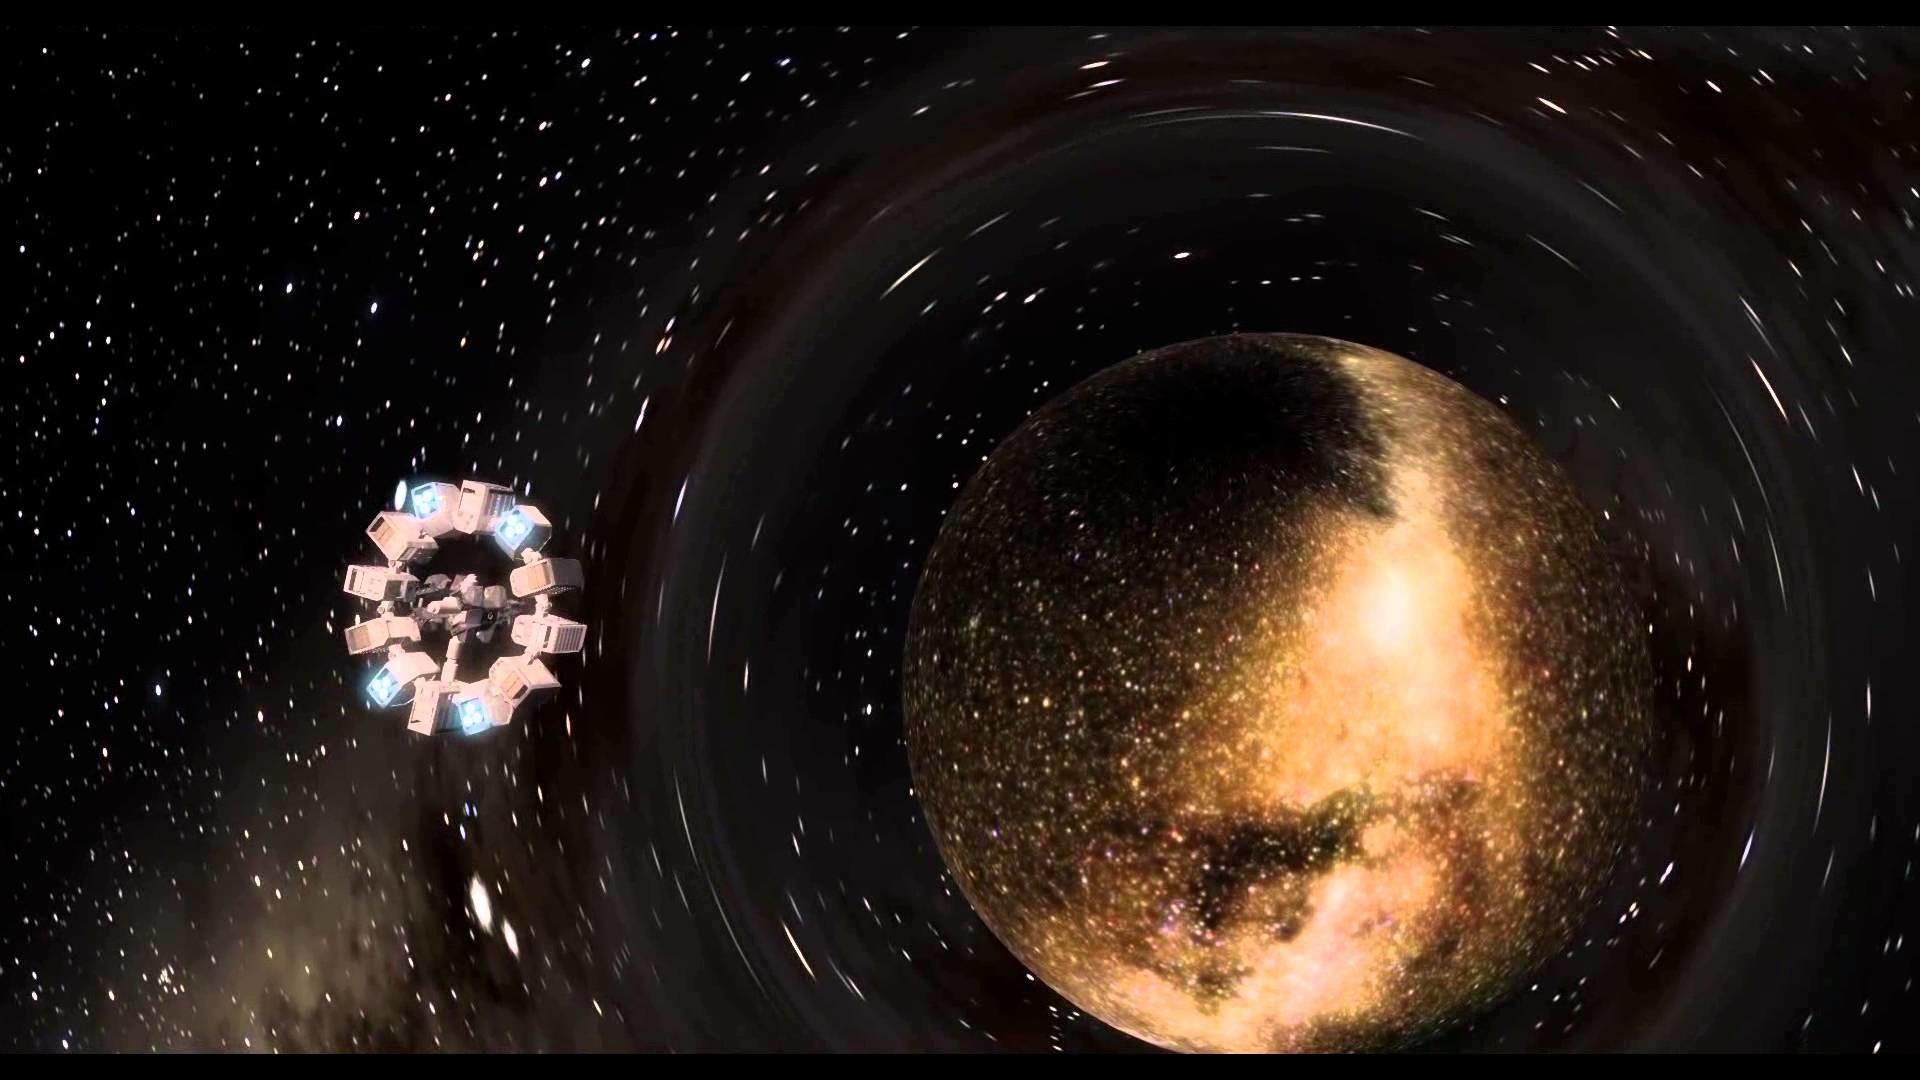 Interstellar Black Hole Wallpaper (73+ images)